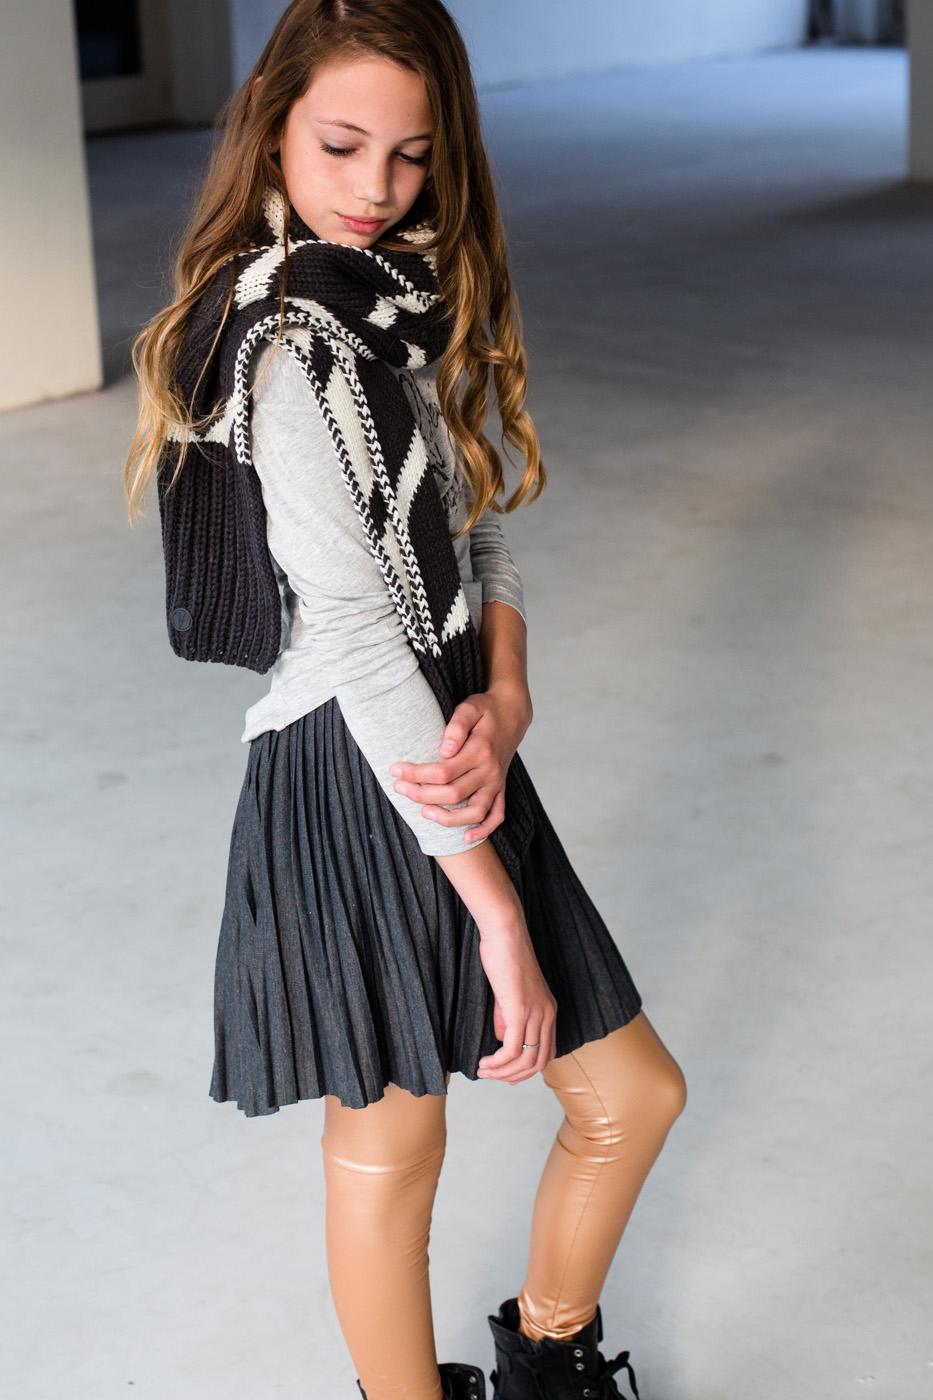 LEVV Girls, LEVV, LEVV winactie, LEVV jurk, meisjesjurkjes, Girlslabel, hippe meisjeskleding, stijlvolle meisjeskleding